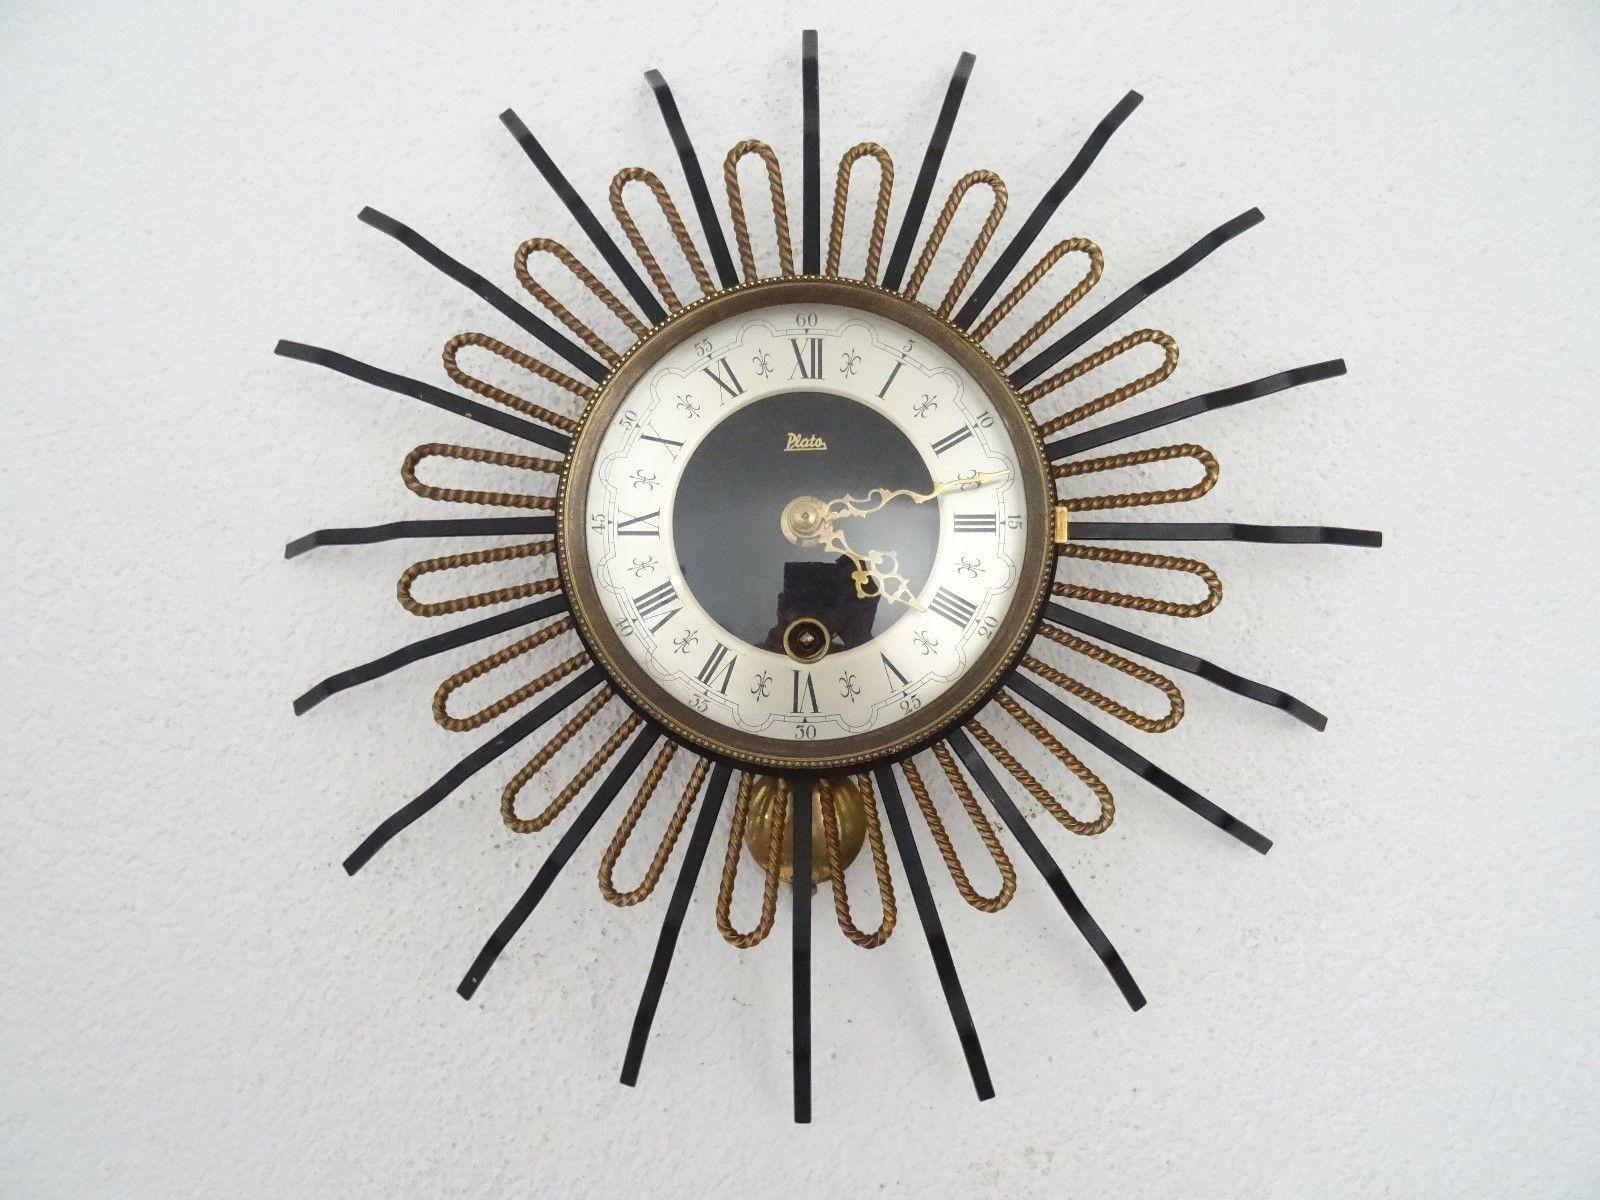 Plato Star Wall Clock Vintage Dutch Art Deco Design Retro (Junghans With Art Deco Wall Clock (Photo 4 of 20)